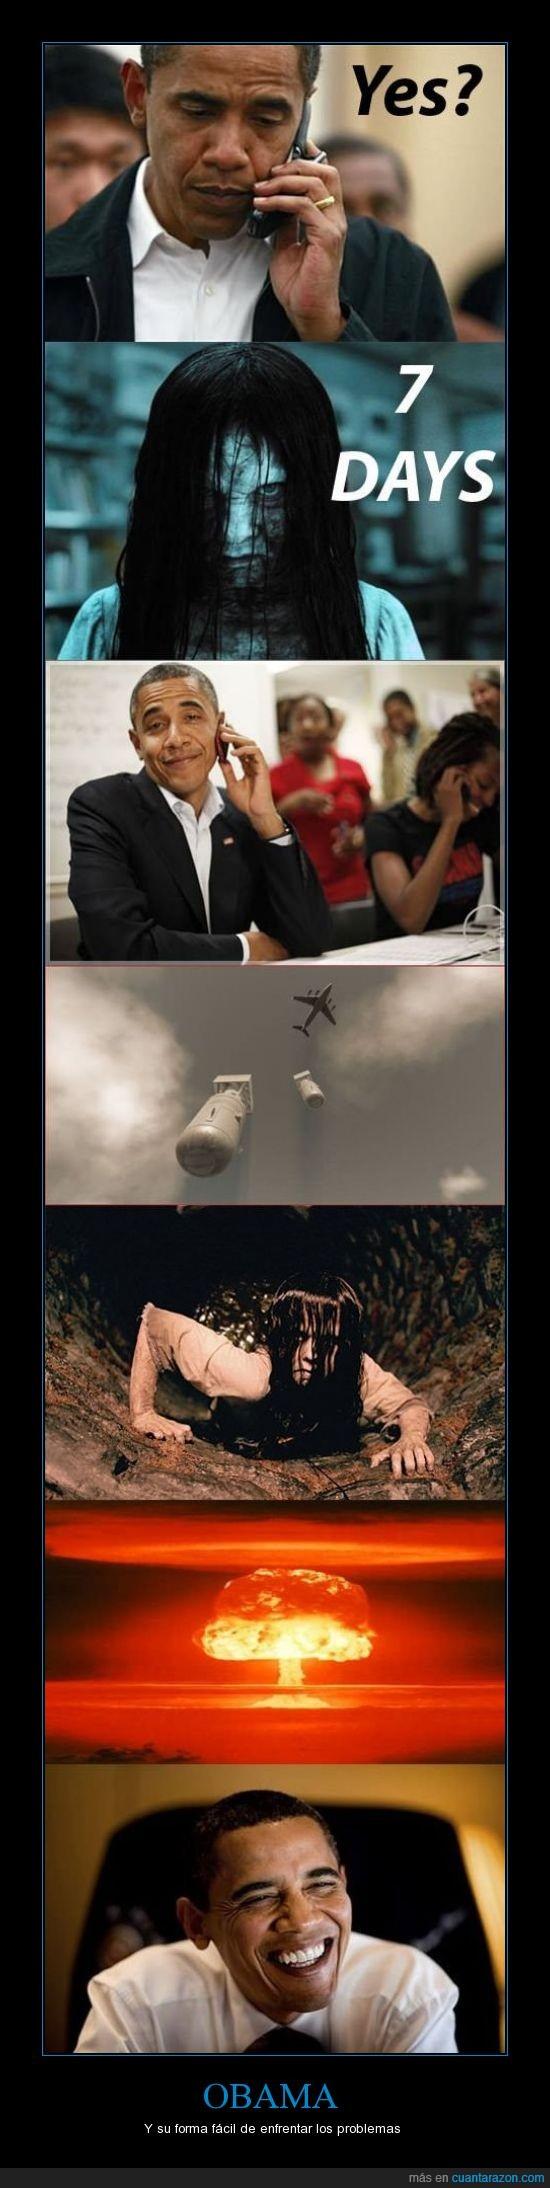 llamada,matar,Obama,problemas,ring,sadako,samara,señal,telefono